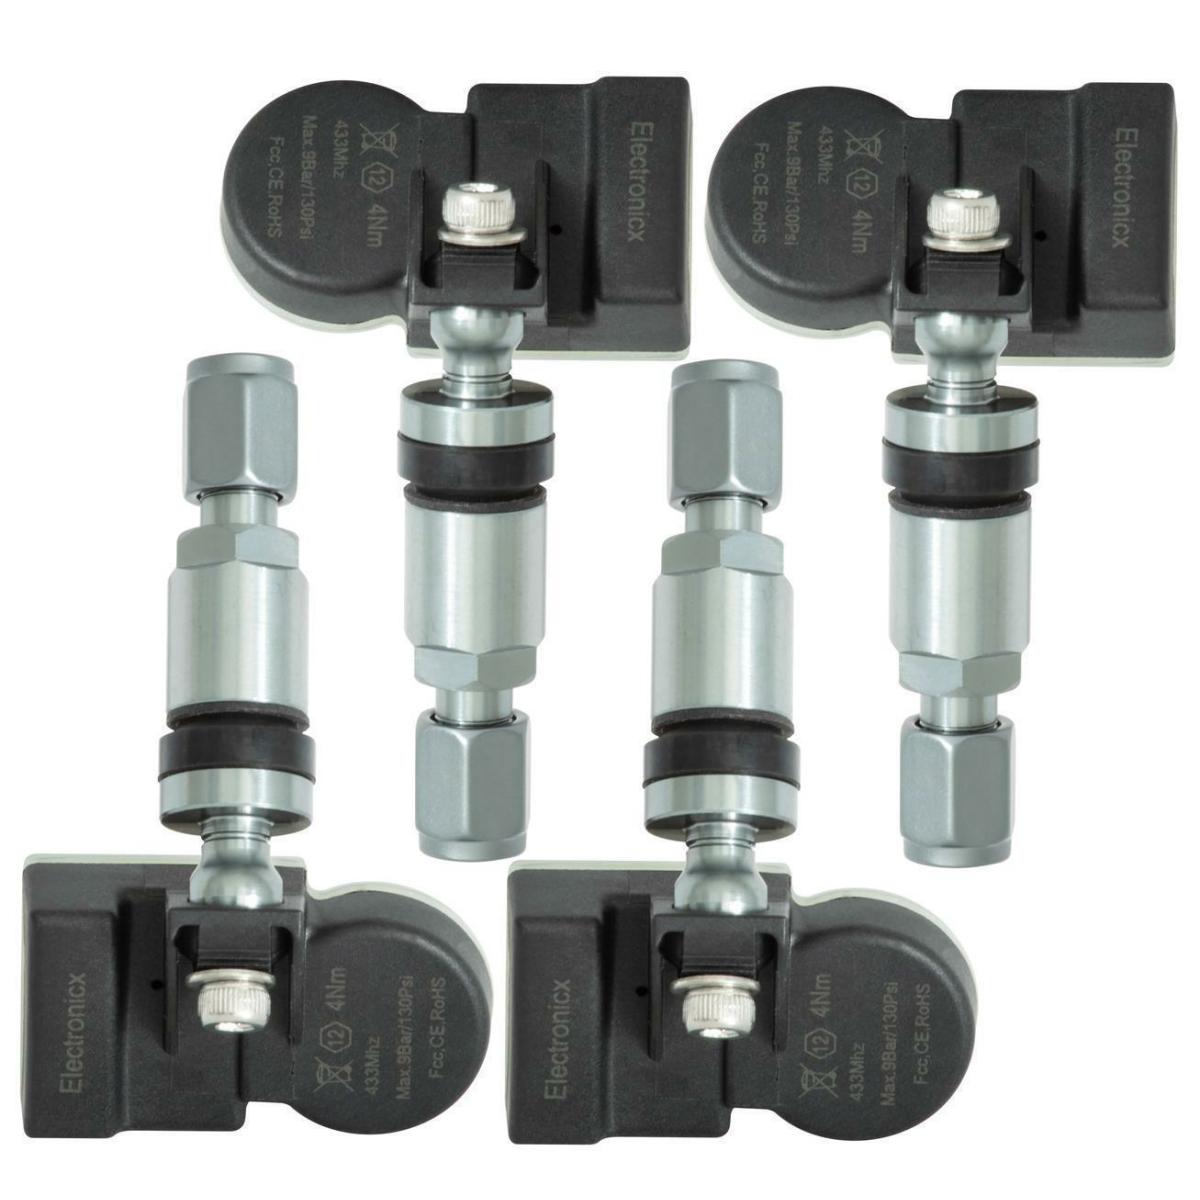 Reifendrucksensoren RDKS Sensoren Metallventil Gunmetal für MINI Cabrio Clubman Countryman Hardtop Paceman